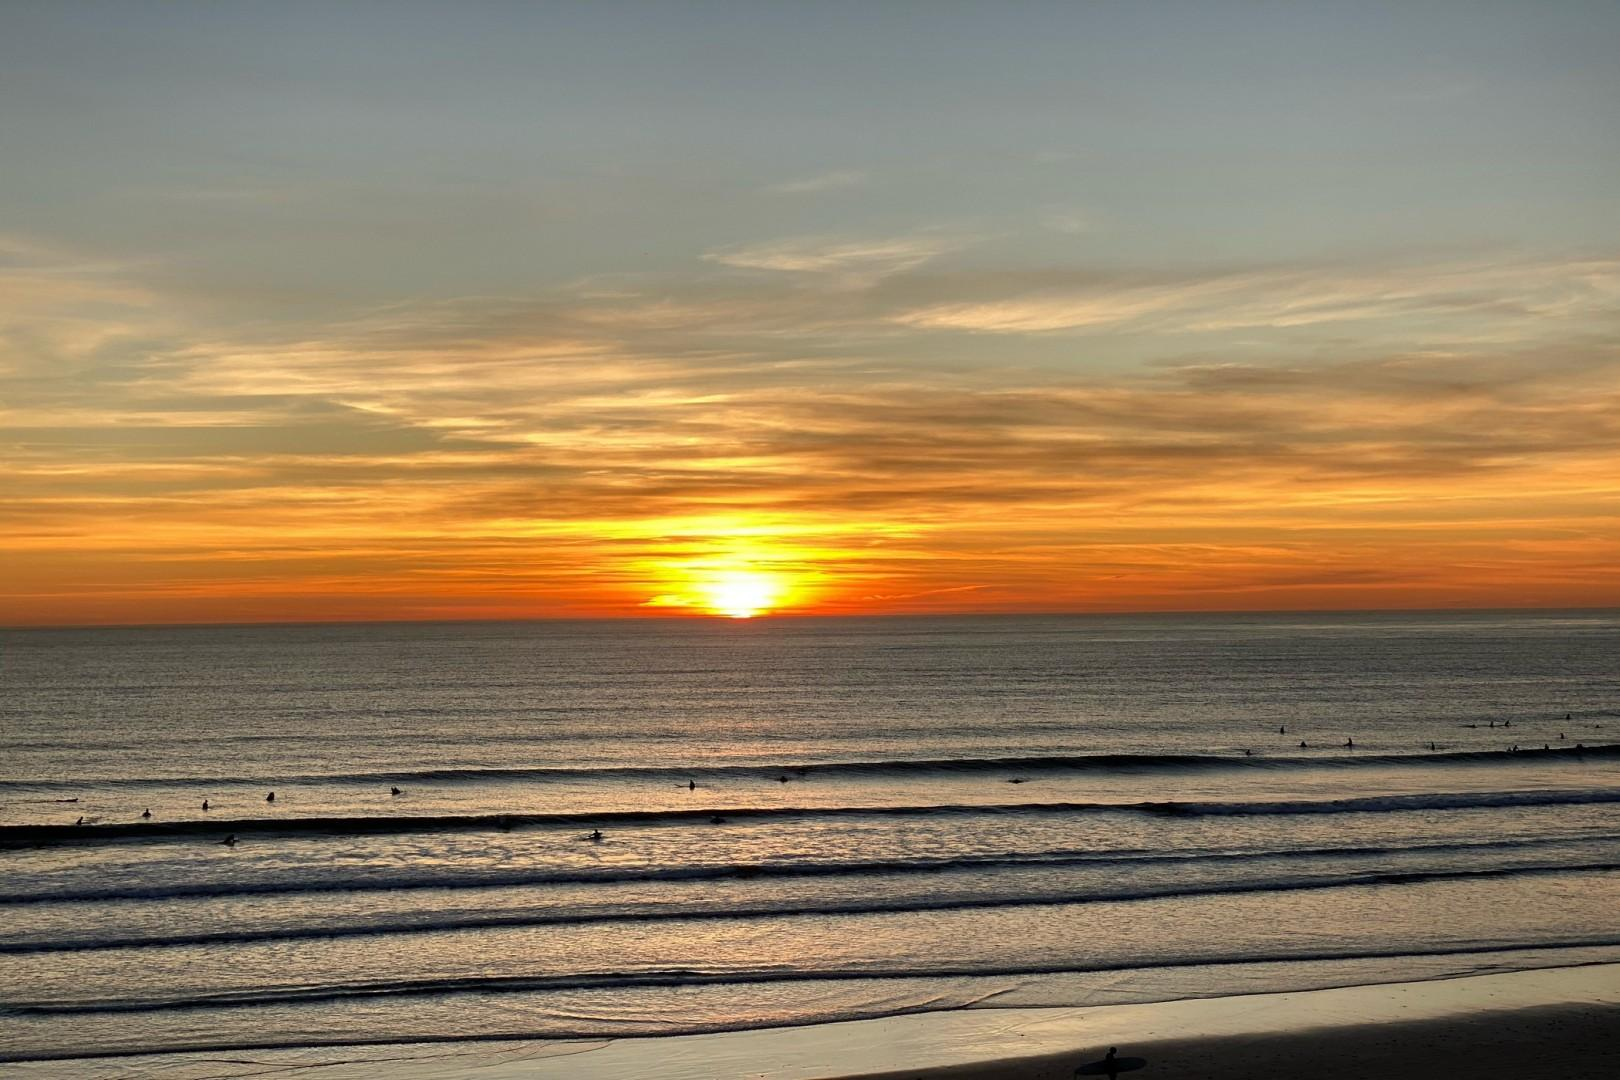 cam-mission-beach-sunset-4